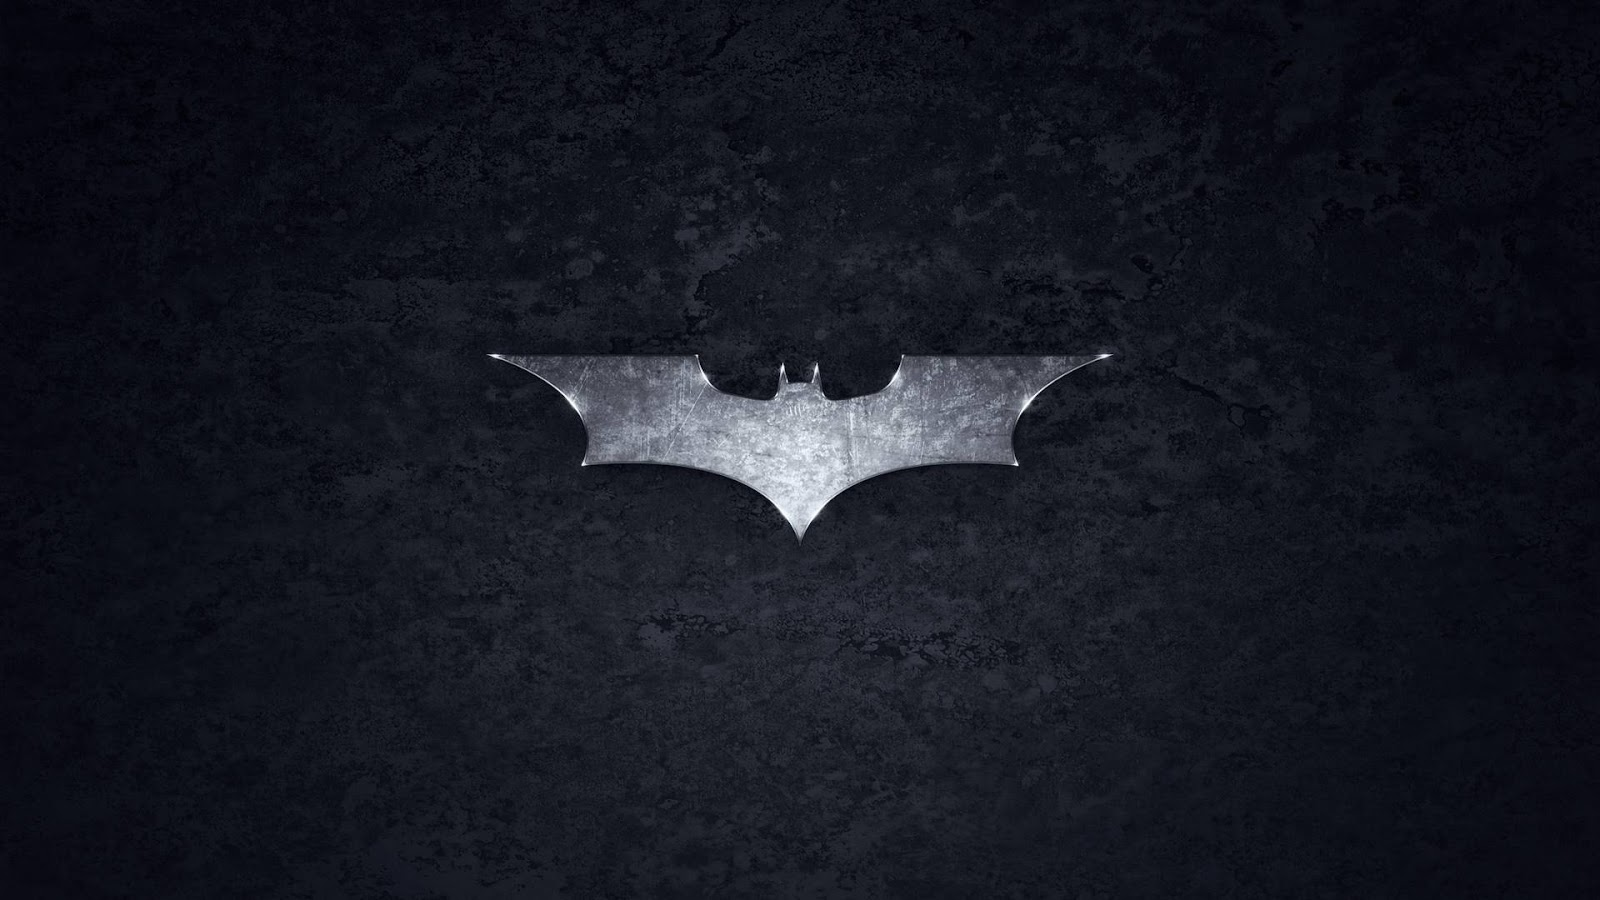 2418 batman black logo 1080p hd wallpaper 1080p hd wallpapersjpg 1600x900